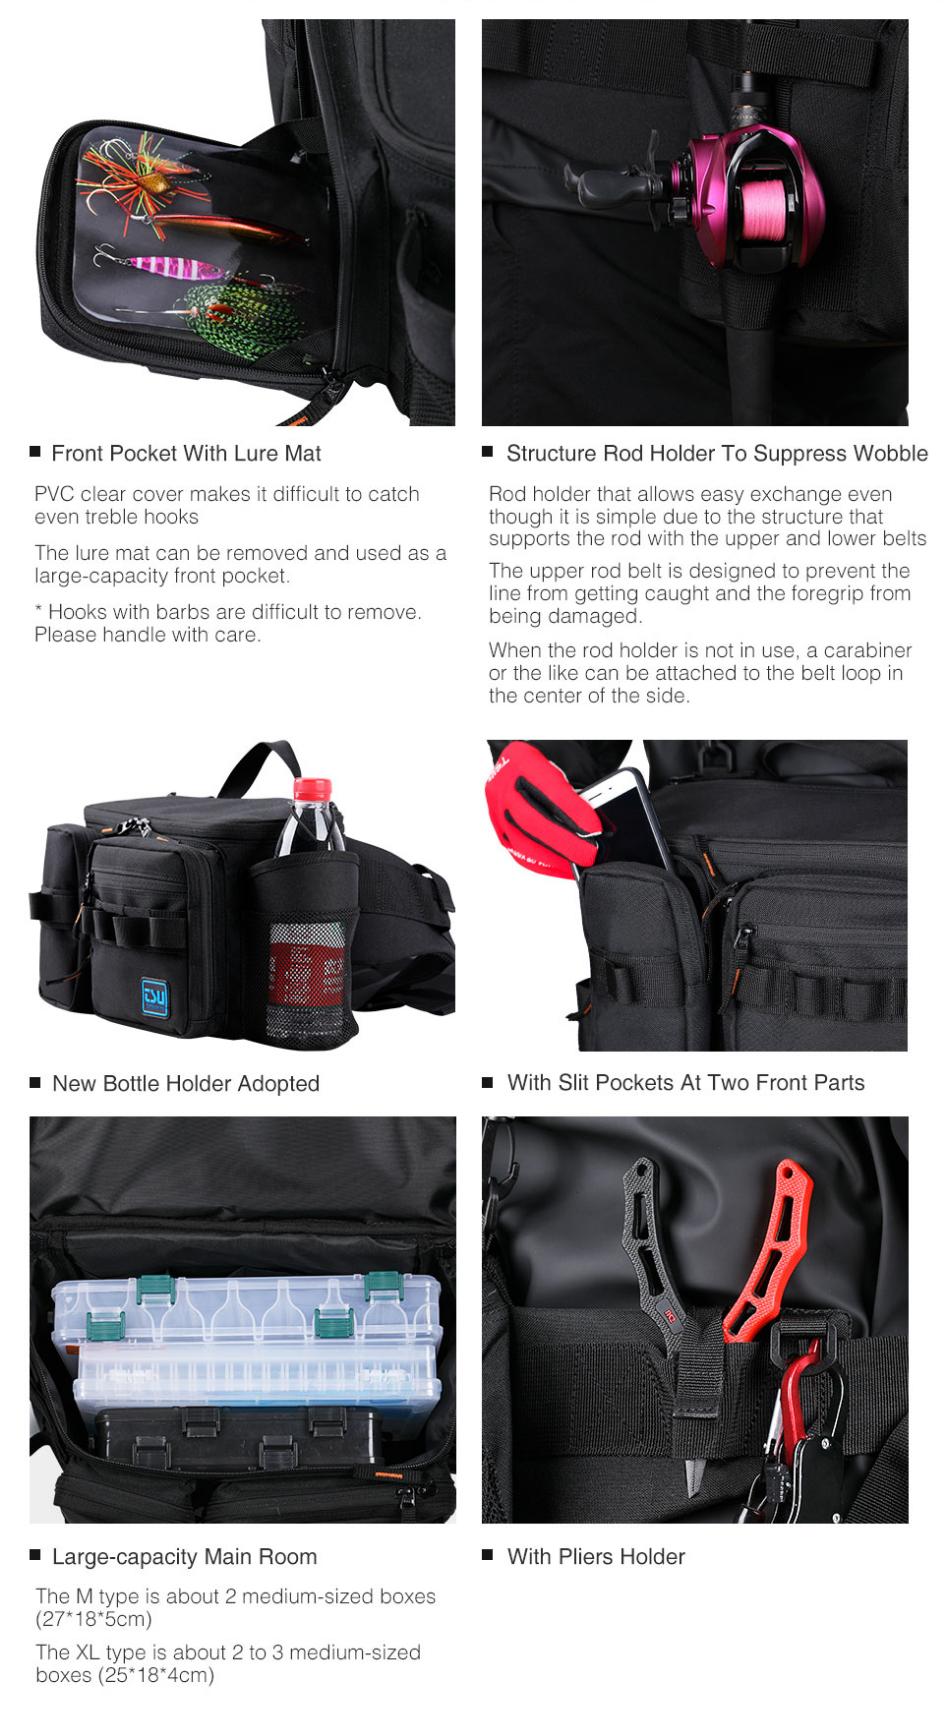 Tsurinoya Multifunction Fishing Lure Bag Rx1911 Outdoor Large Capacity Hip Bag Shoulder Bags Fishing Tackle Pack View Fishing Tackle Bag Tsurinoya Product Details From Weihai Diaozhiwu Fishing Tackle Co Ltd On Alibaba Com